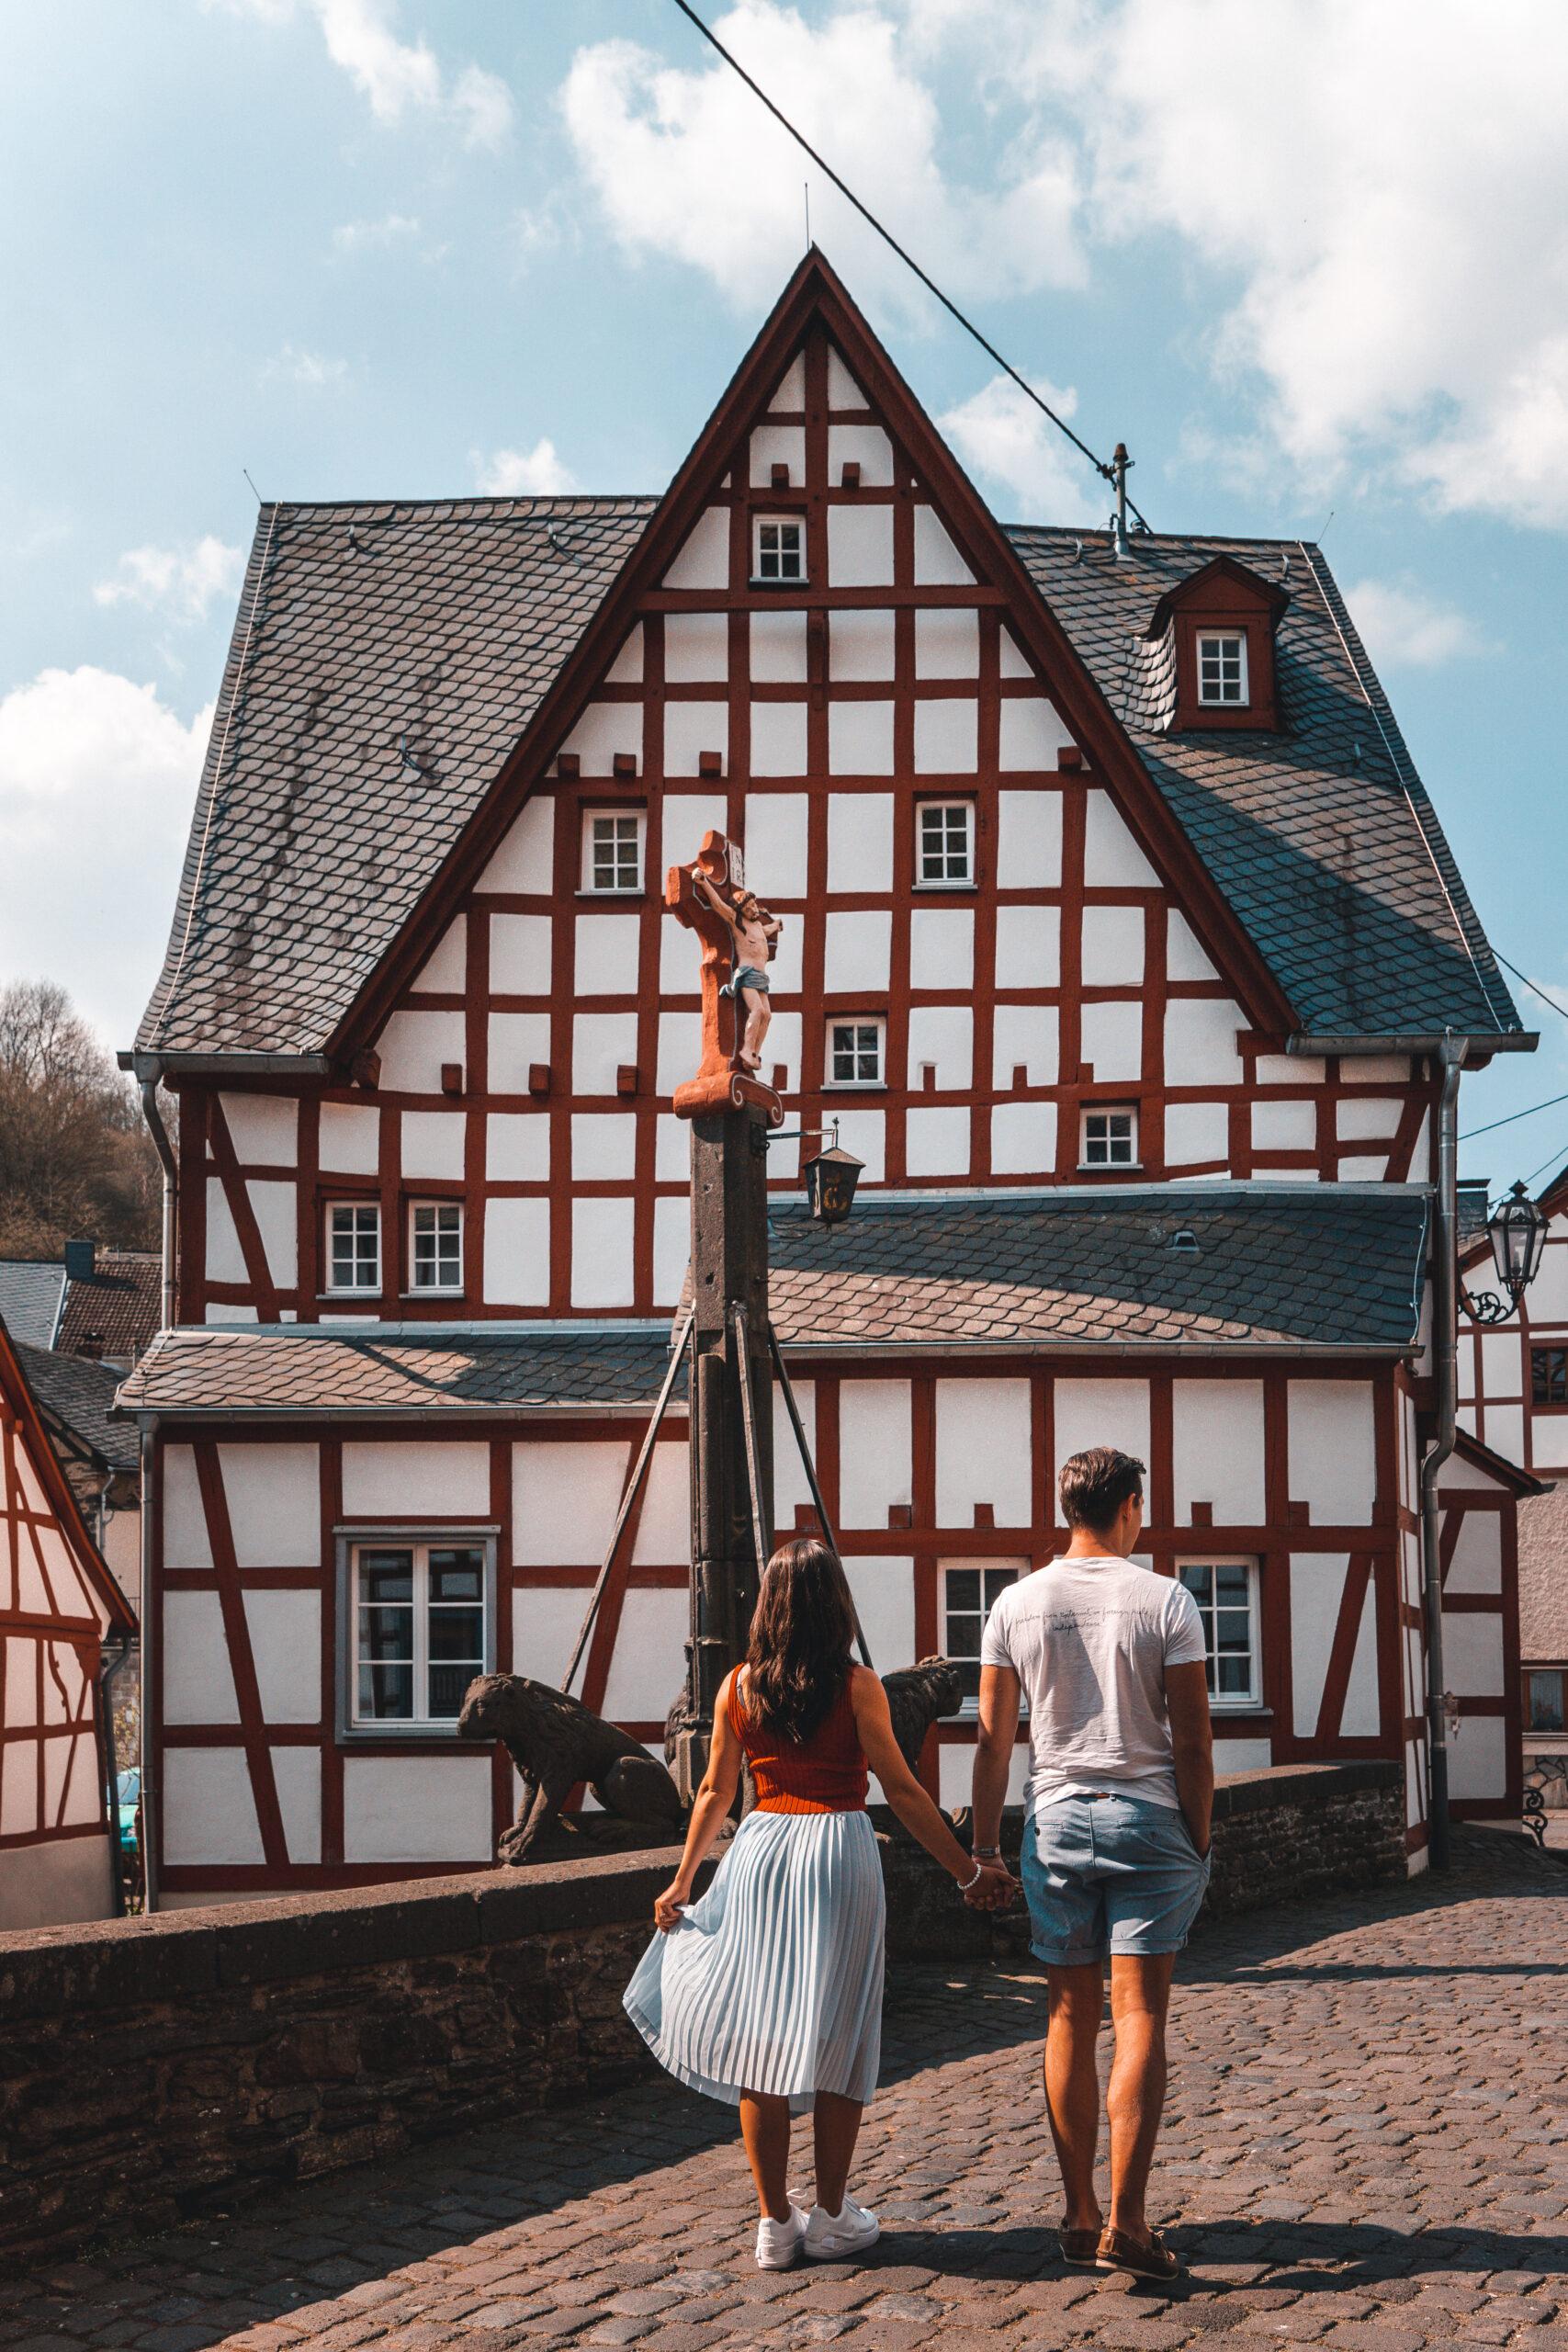 Monreal in the German Eifel